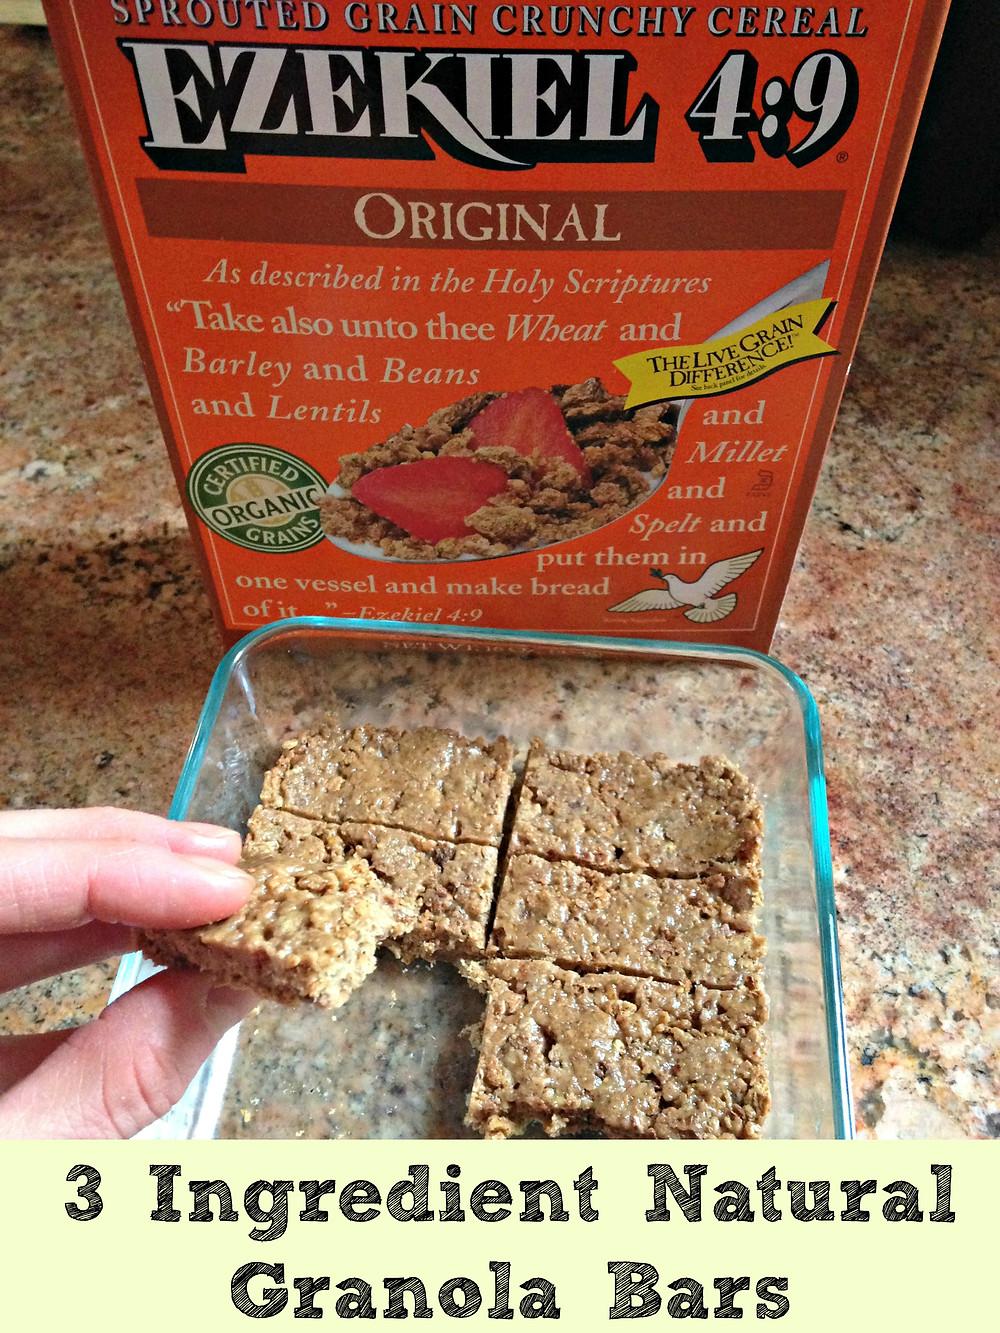 Ezekial granola bars.jpg